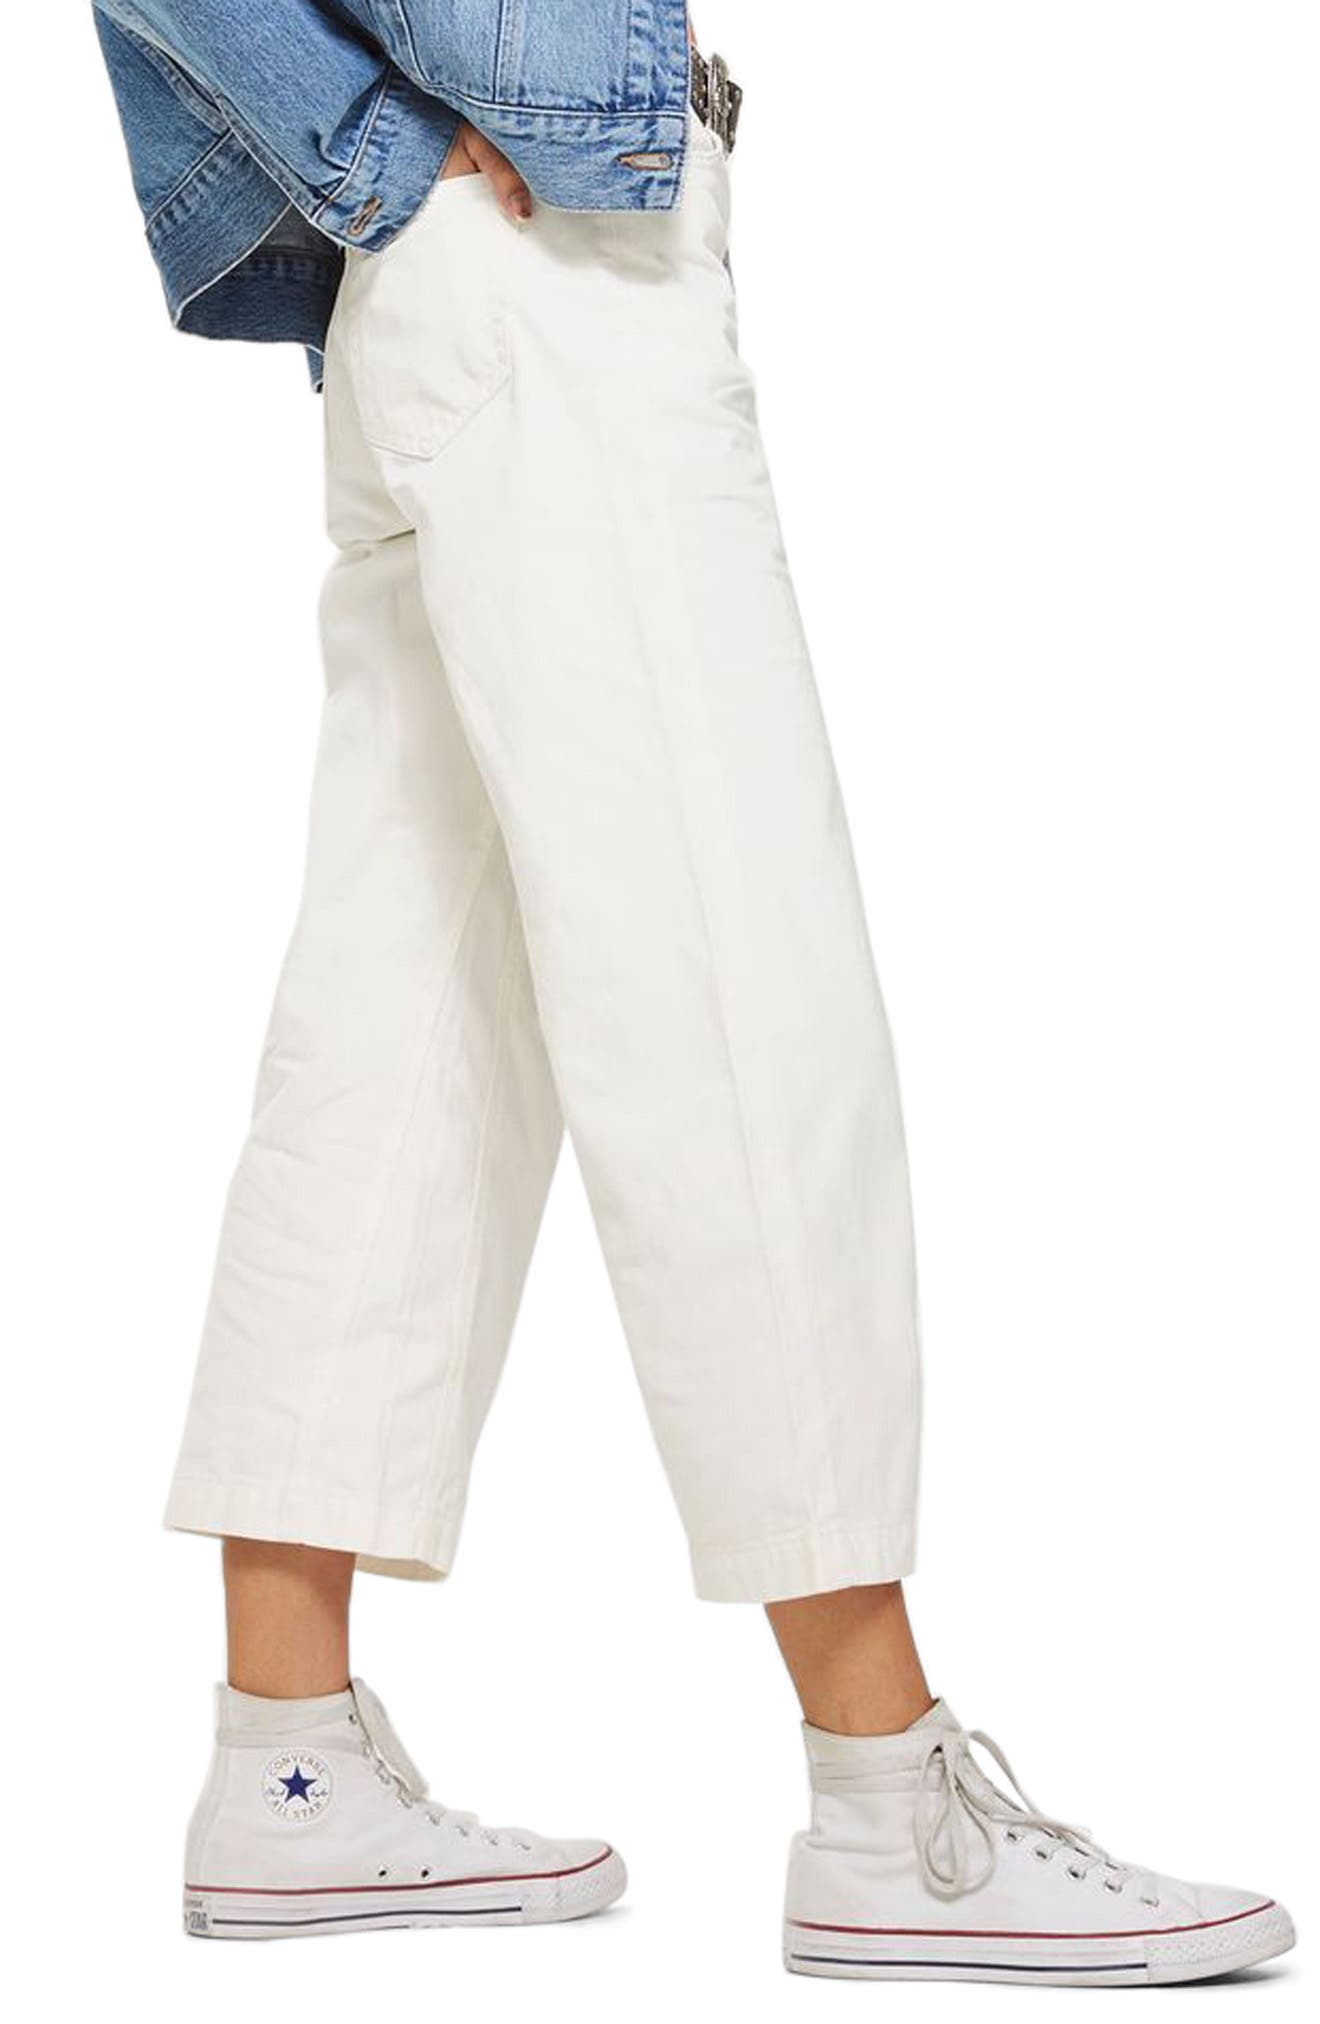 MOTO Cropped Wide Leg Non-Stretch Jeans,                             Alternate thumbnail 2, color,                             White